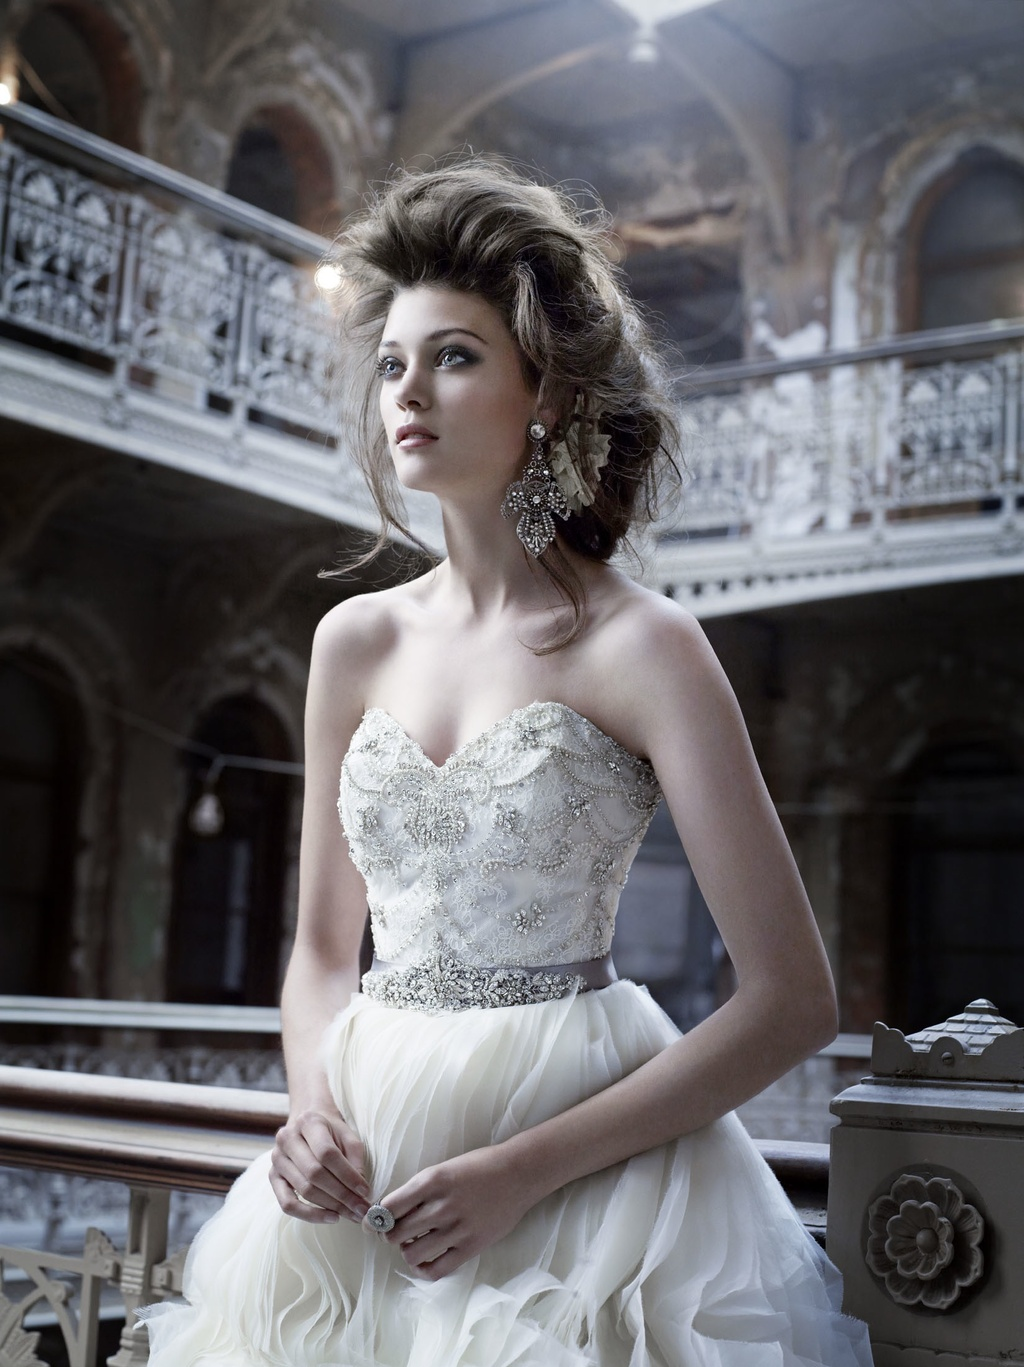 Wedding-dress-fall-2011-bridal-gowns-lazaro-3153-detail.full